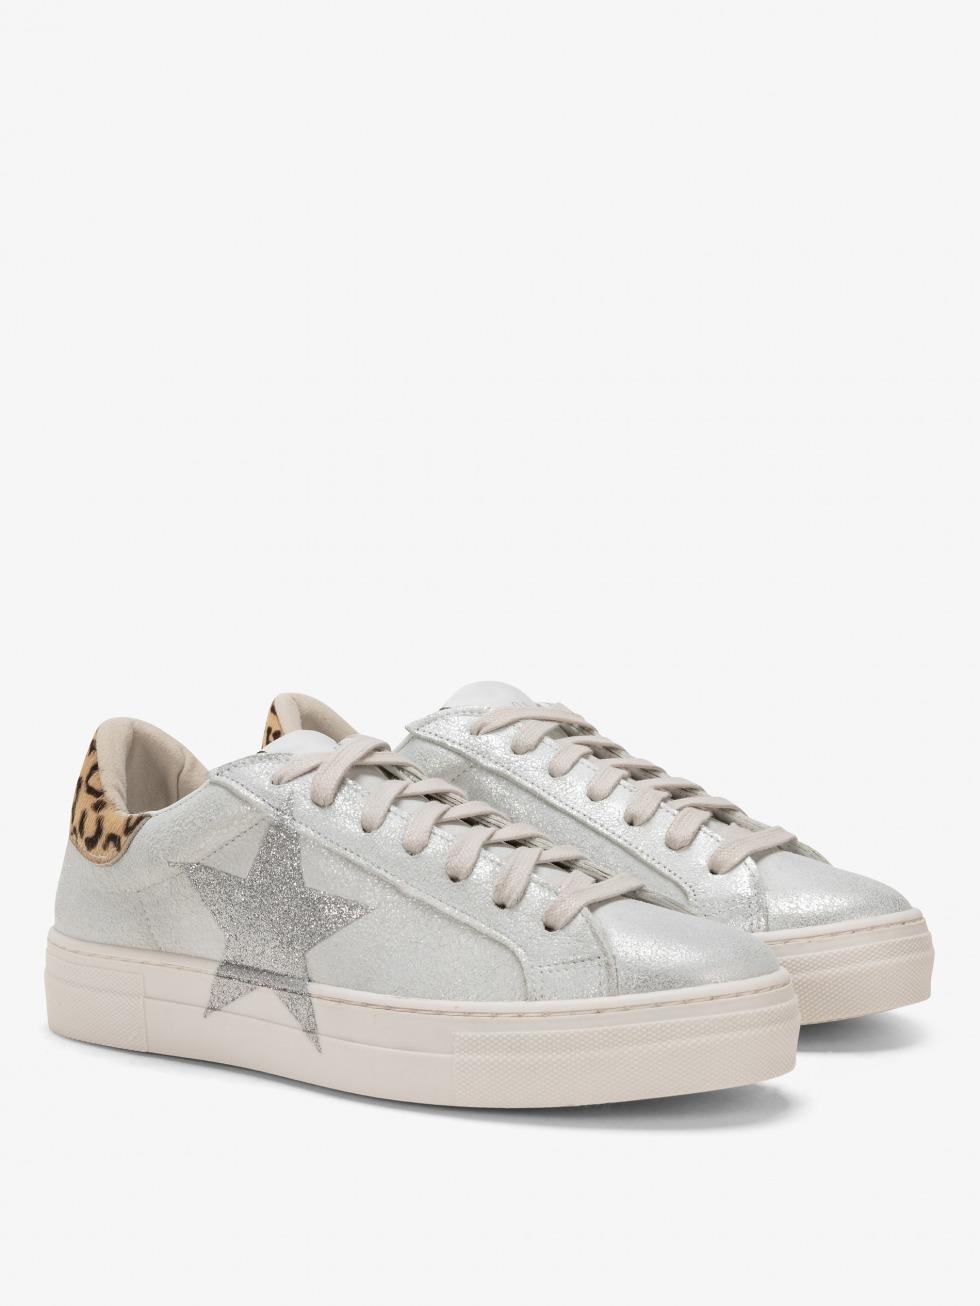 Martini Sneakers Vintage White - Star